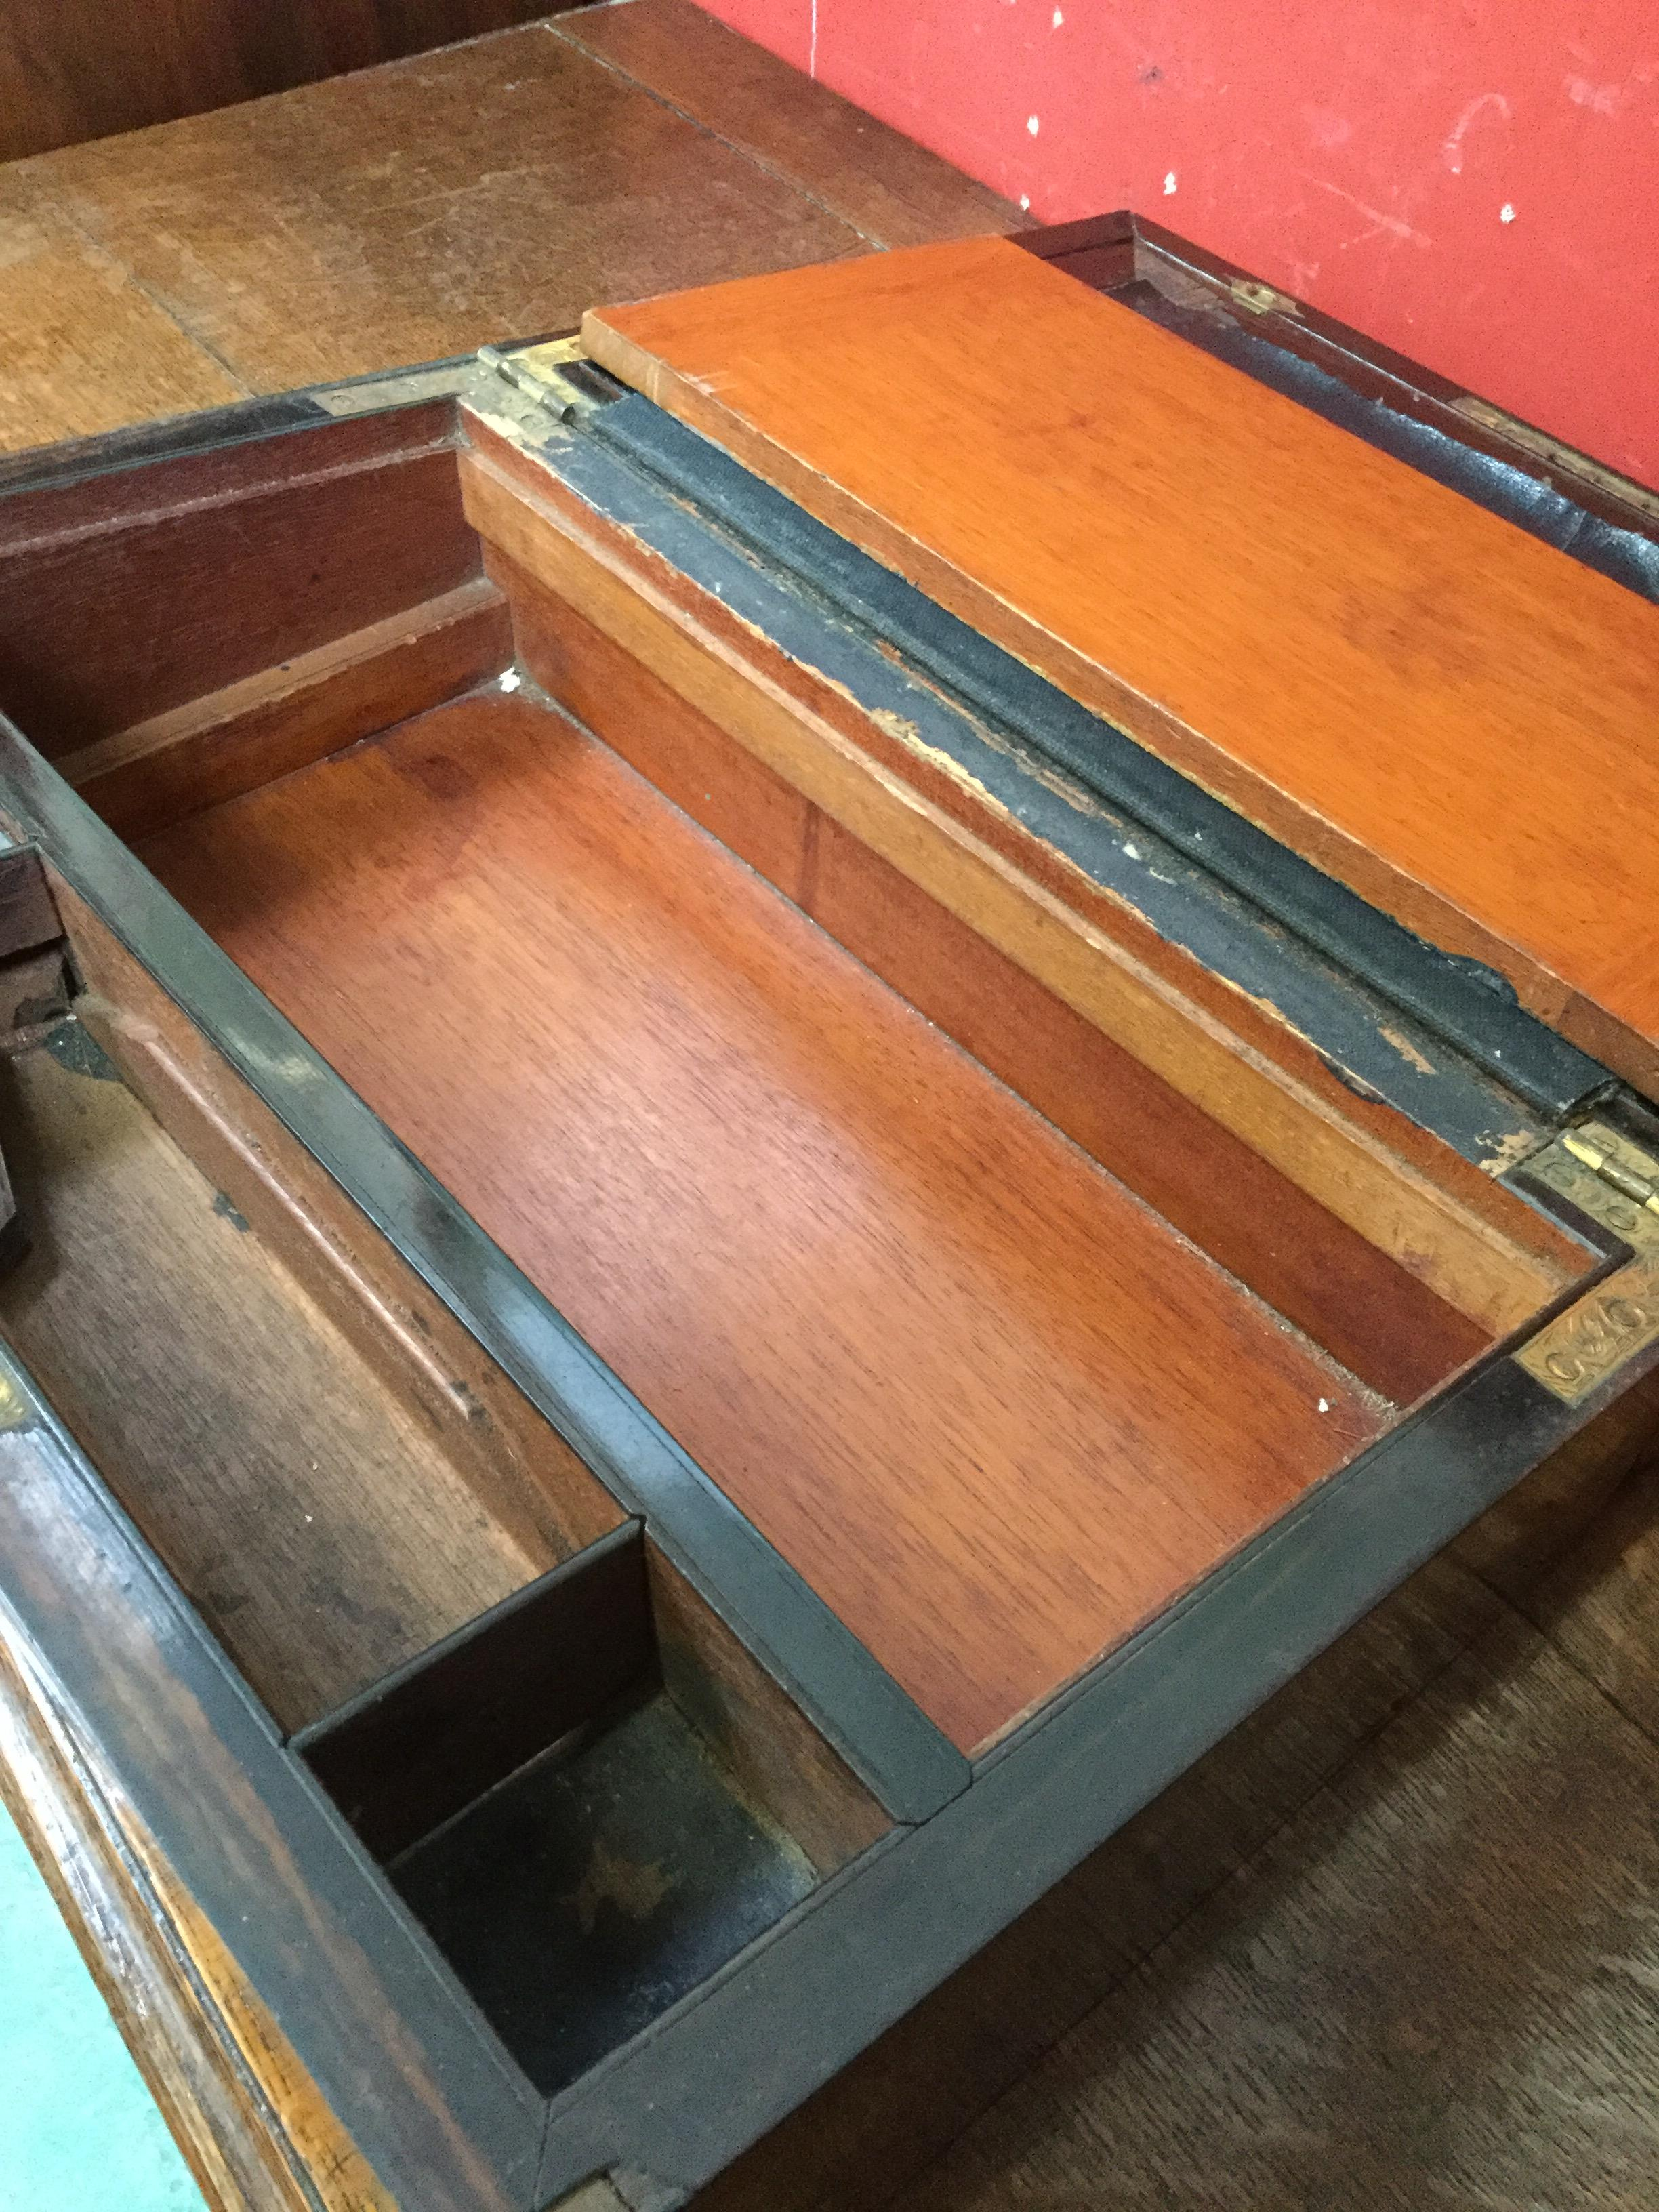 Lot 52 - A 19th century burr walnut rectangular desk box, 35.